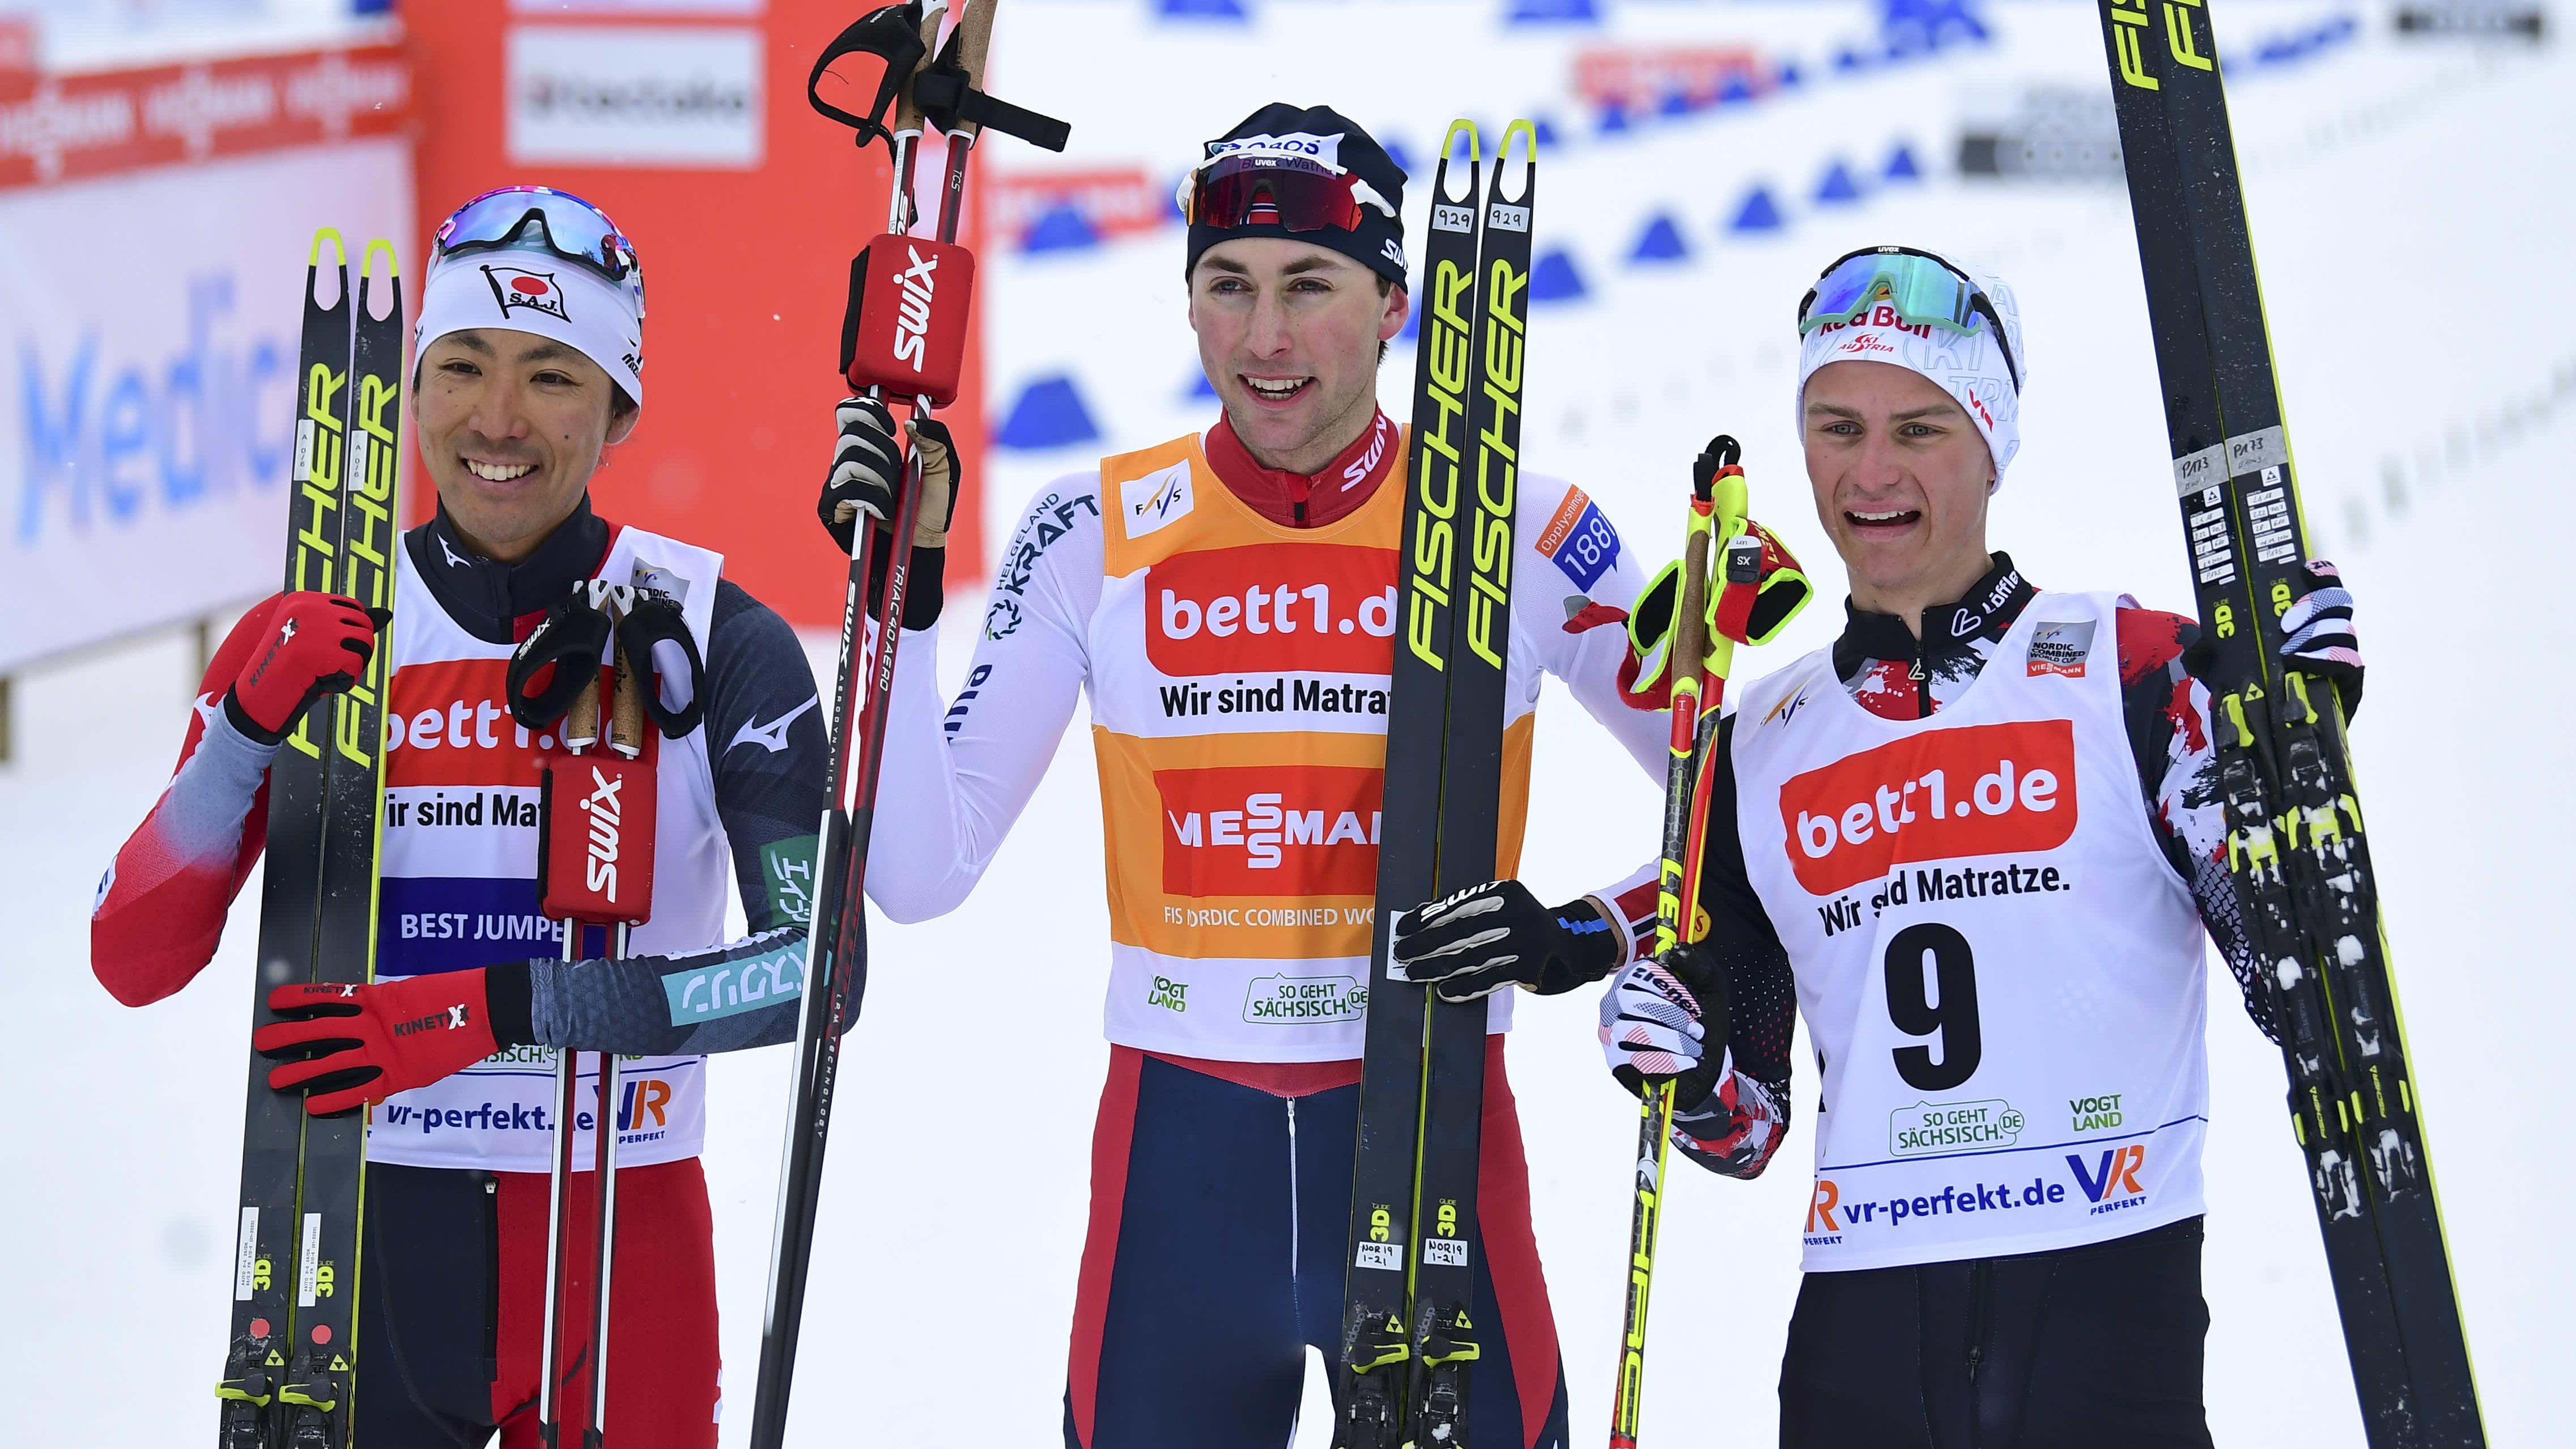 Akito Watabe, Jarl Magnus Riiber ja Akito Watabe Klingenthalin maailmancup-osakilpailun jälkeen maaliskuussa 2021.